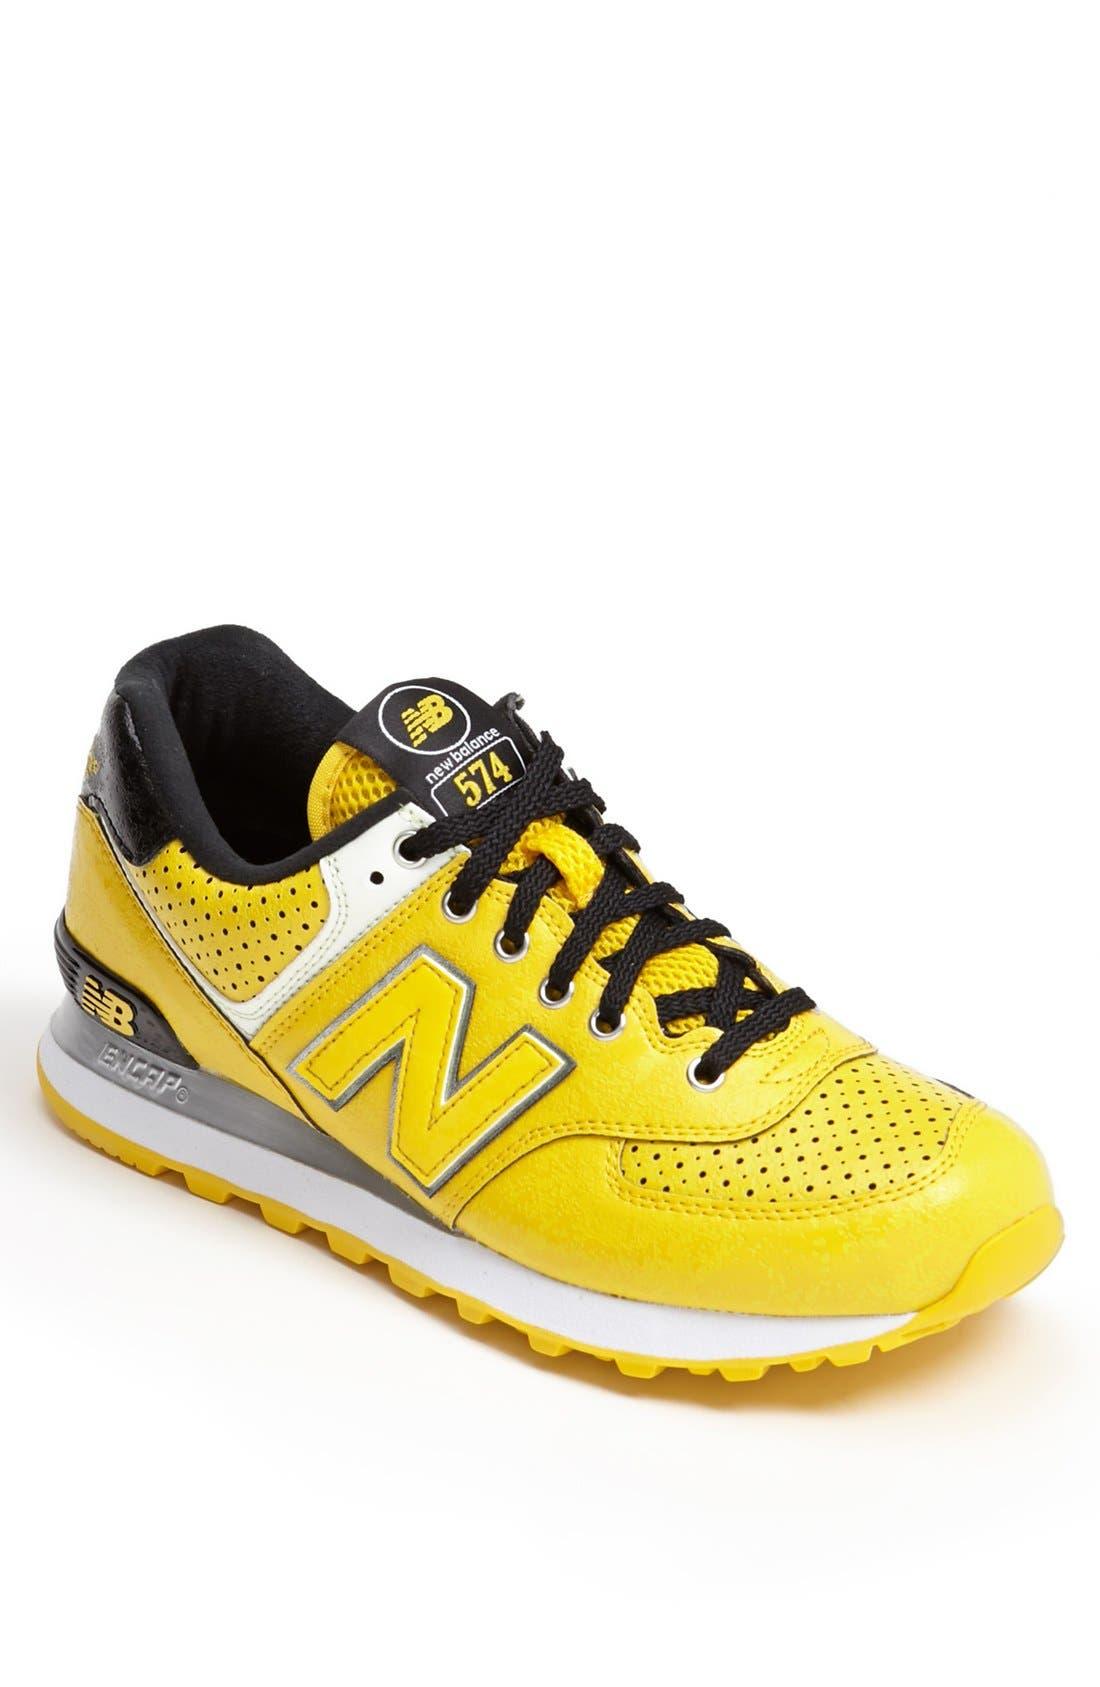 Main Image - New Balance '574 Alpha Moon' Sneaker (Men)